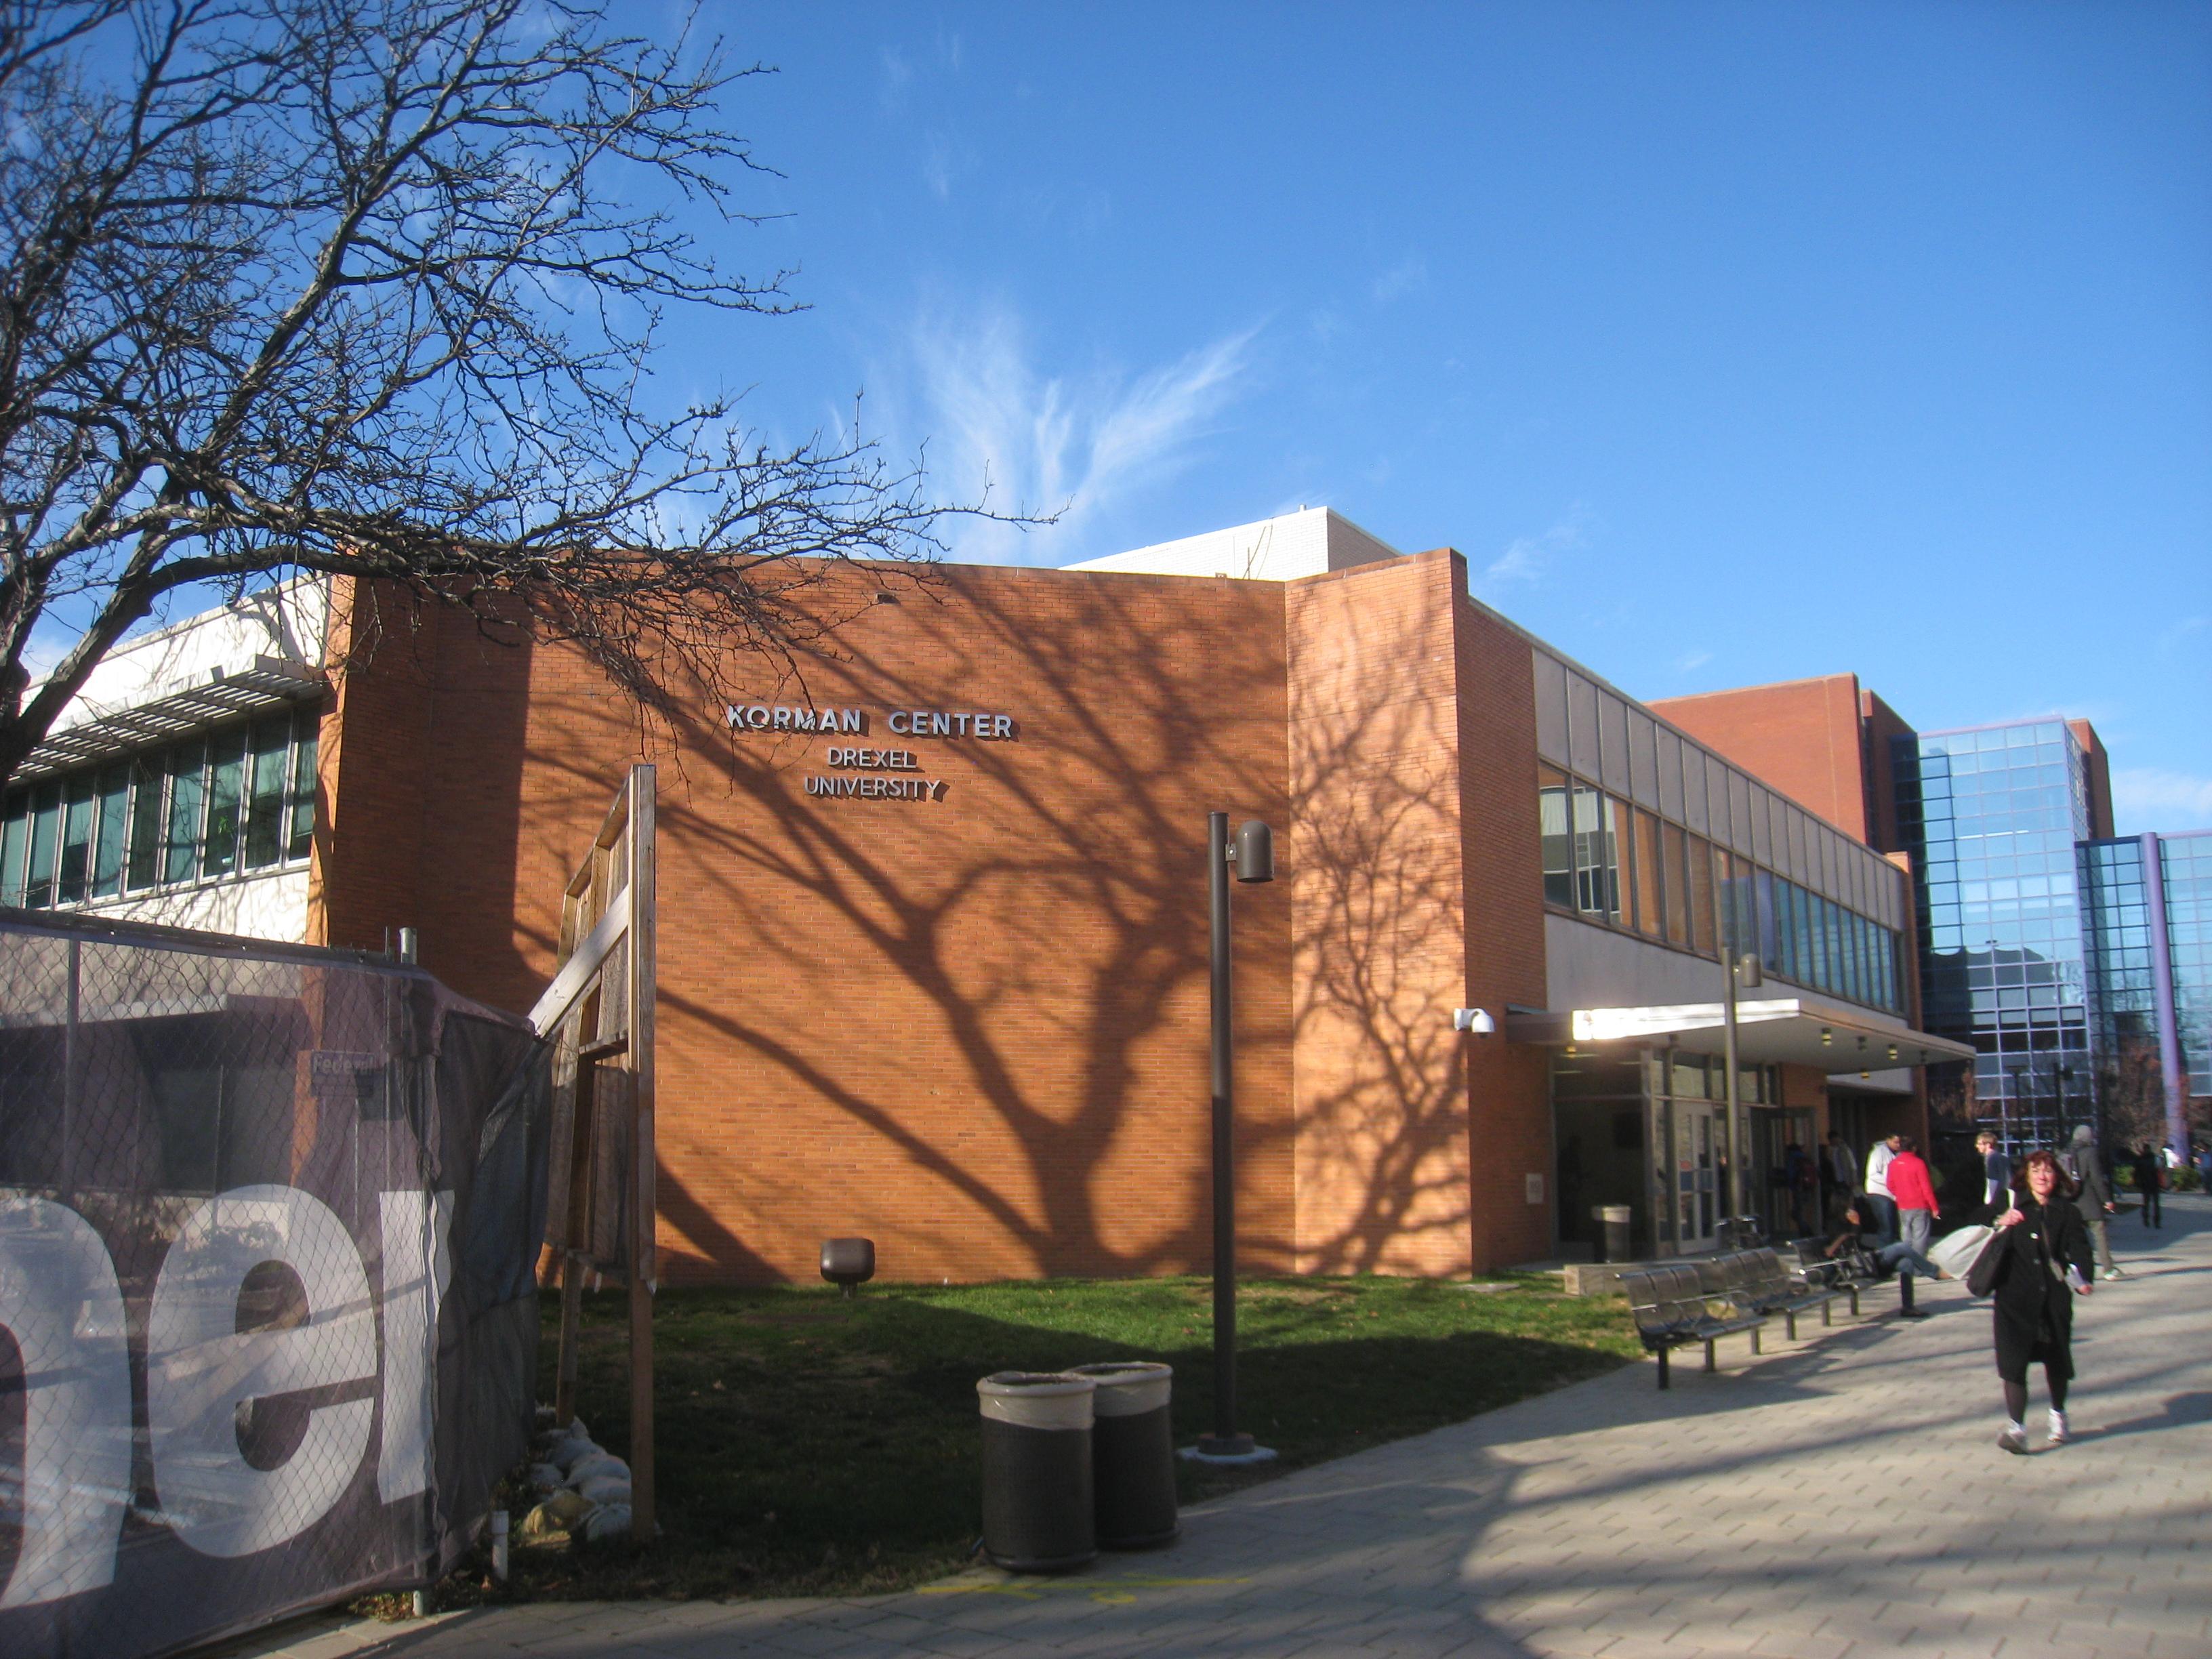 filekorman center drexel university img 7316 jpg wikimedia